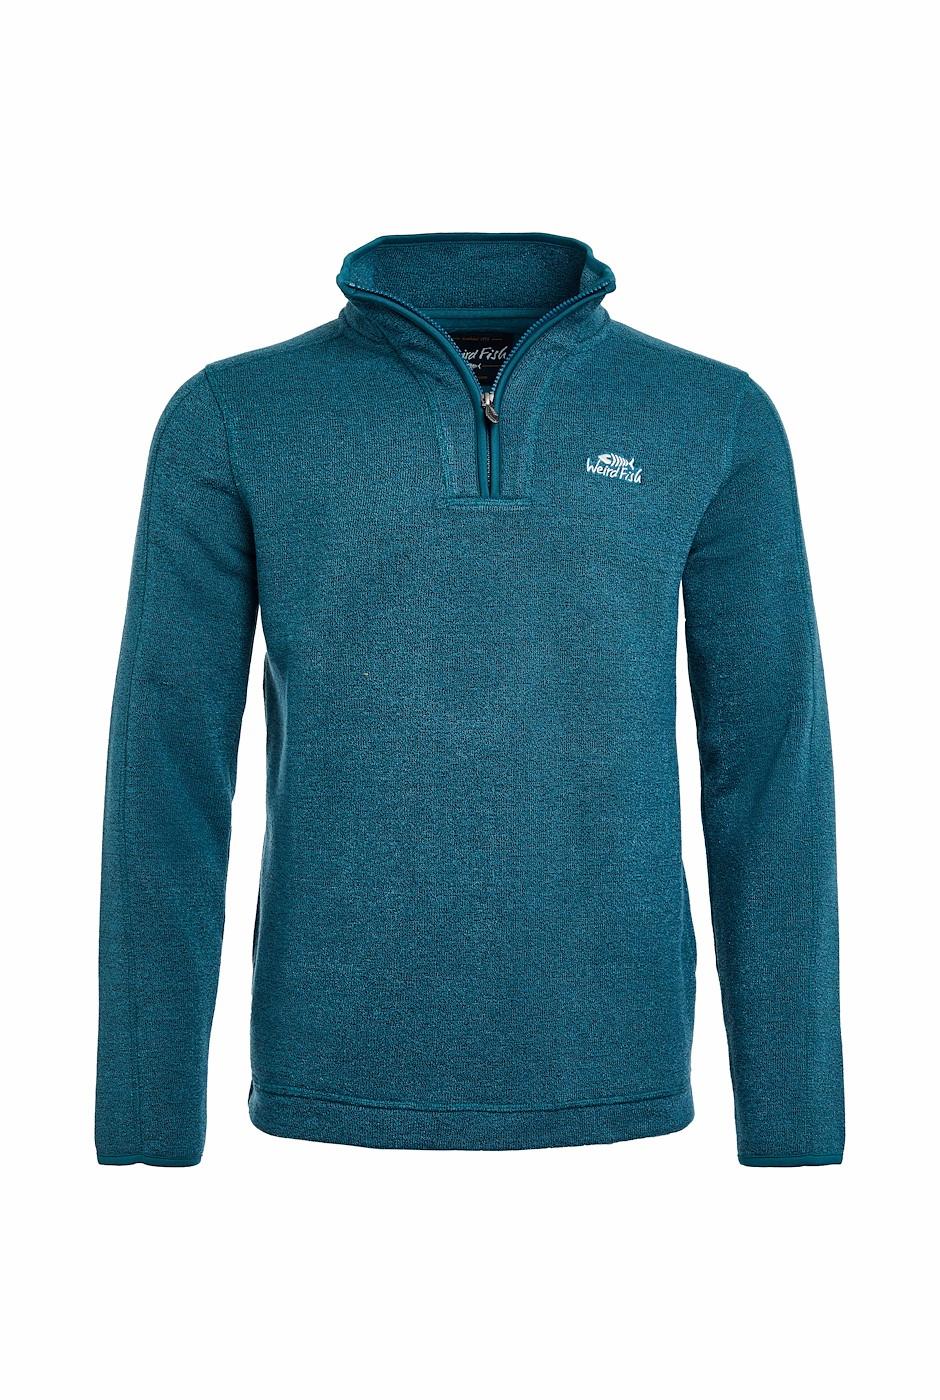 Stowe 1/4 Zip Soft Knit Petrol Blue